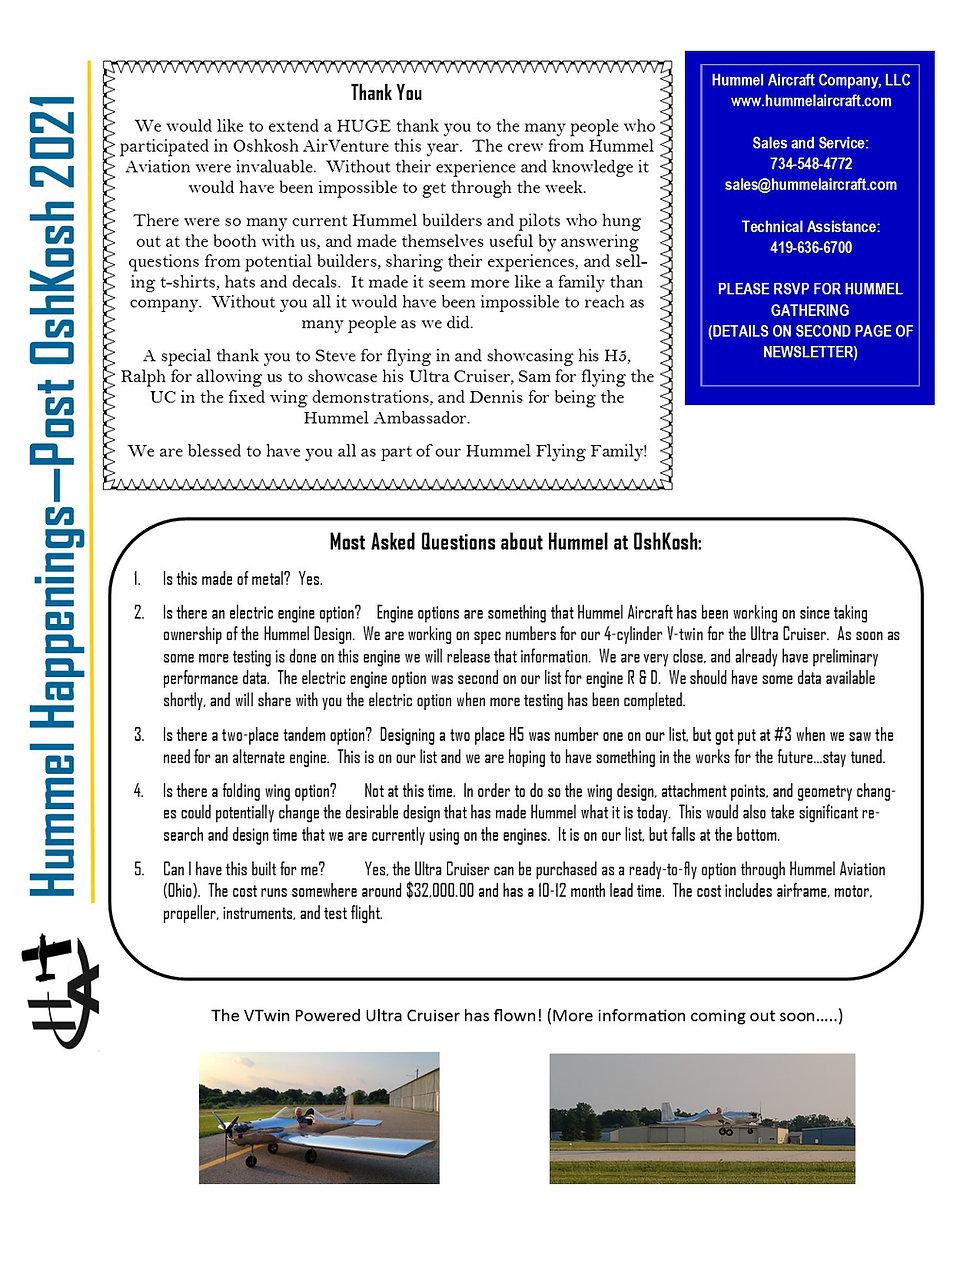 HH_Newsletter_Post OshKosh Page 1.jpg